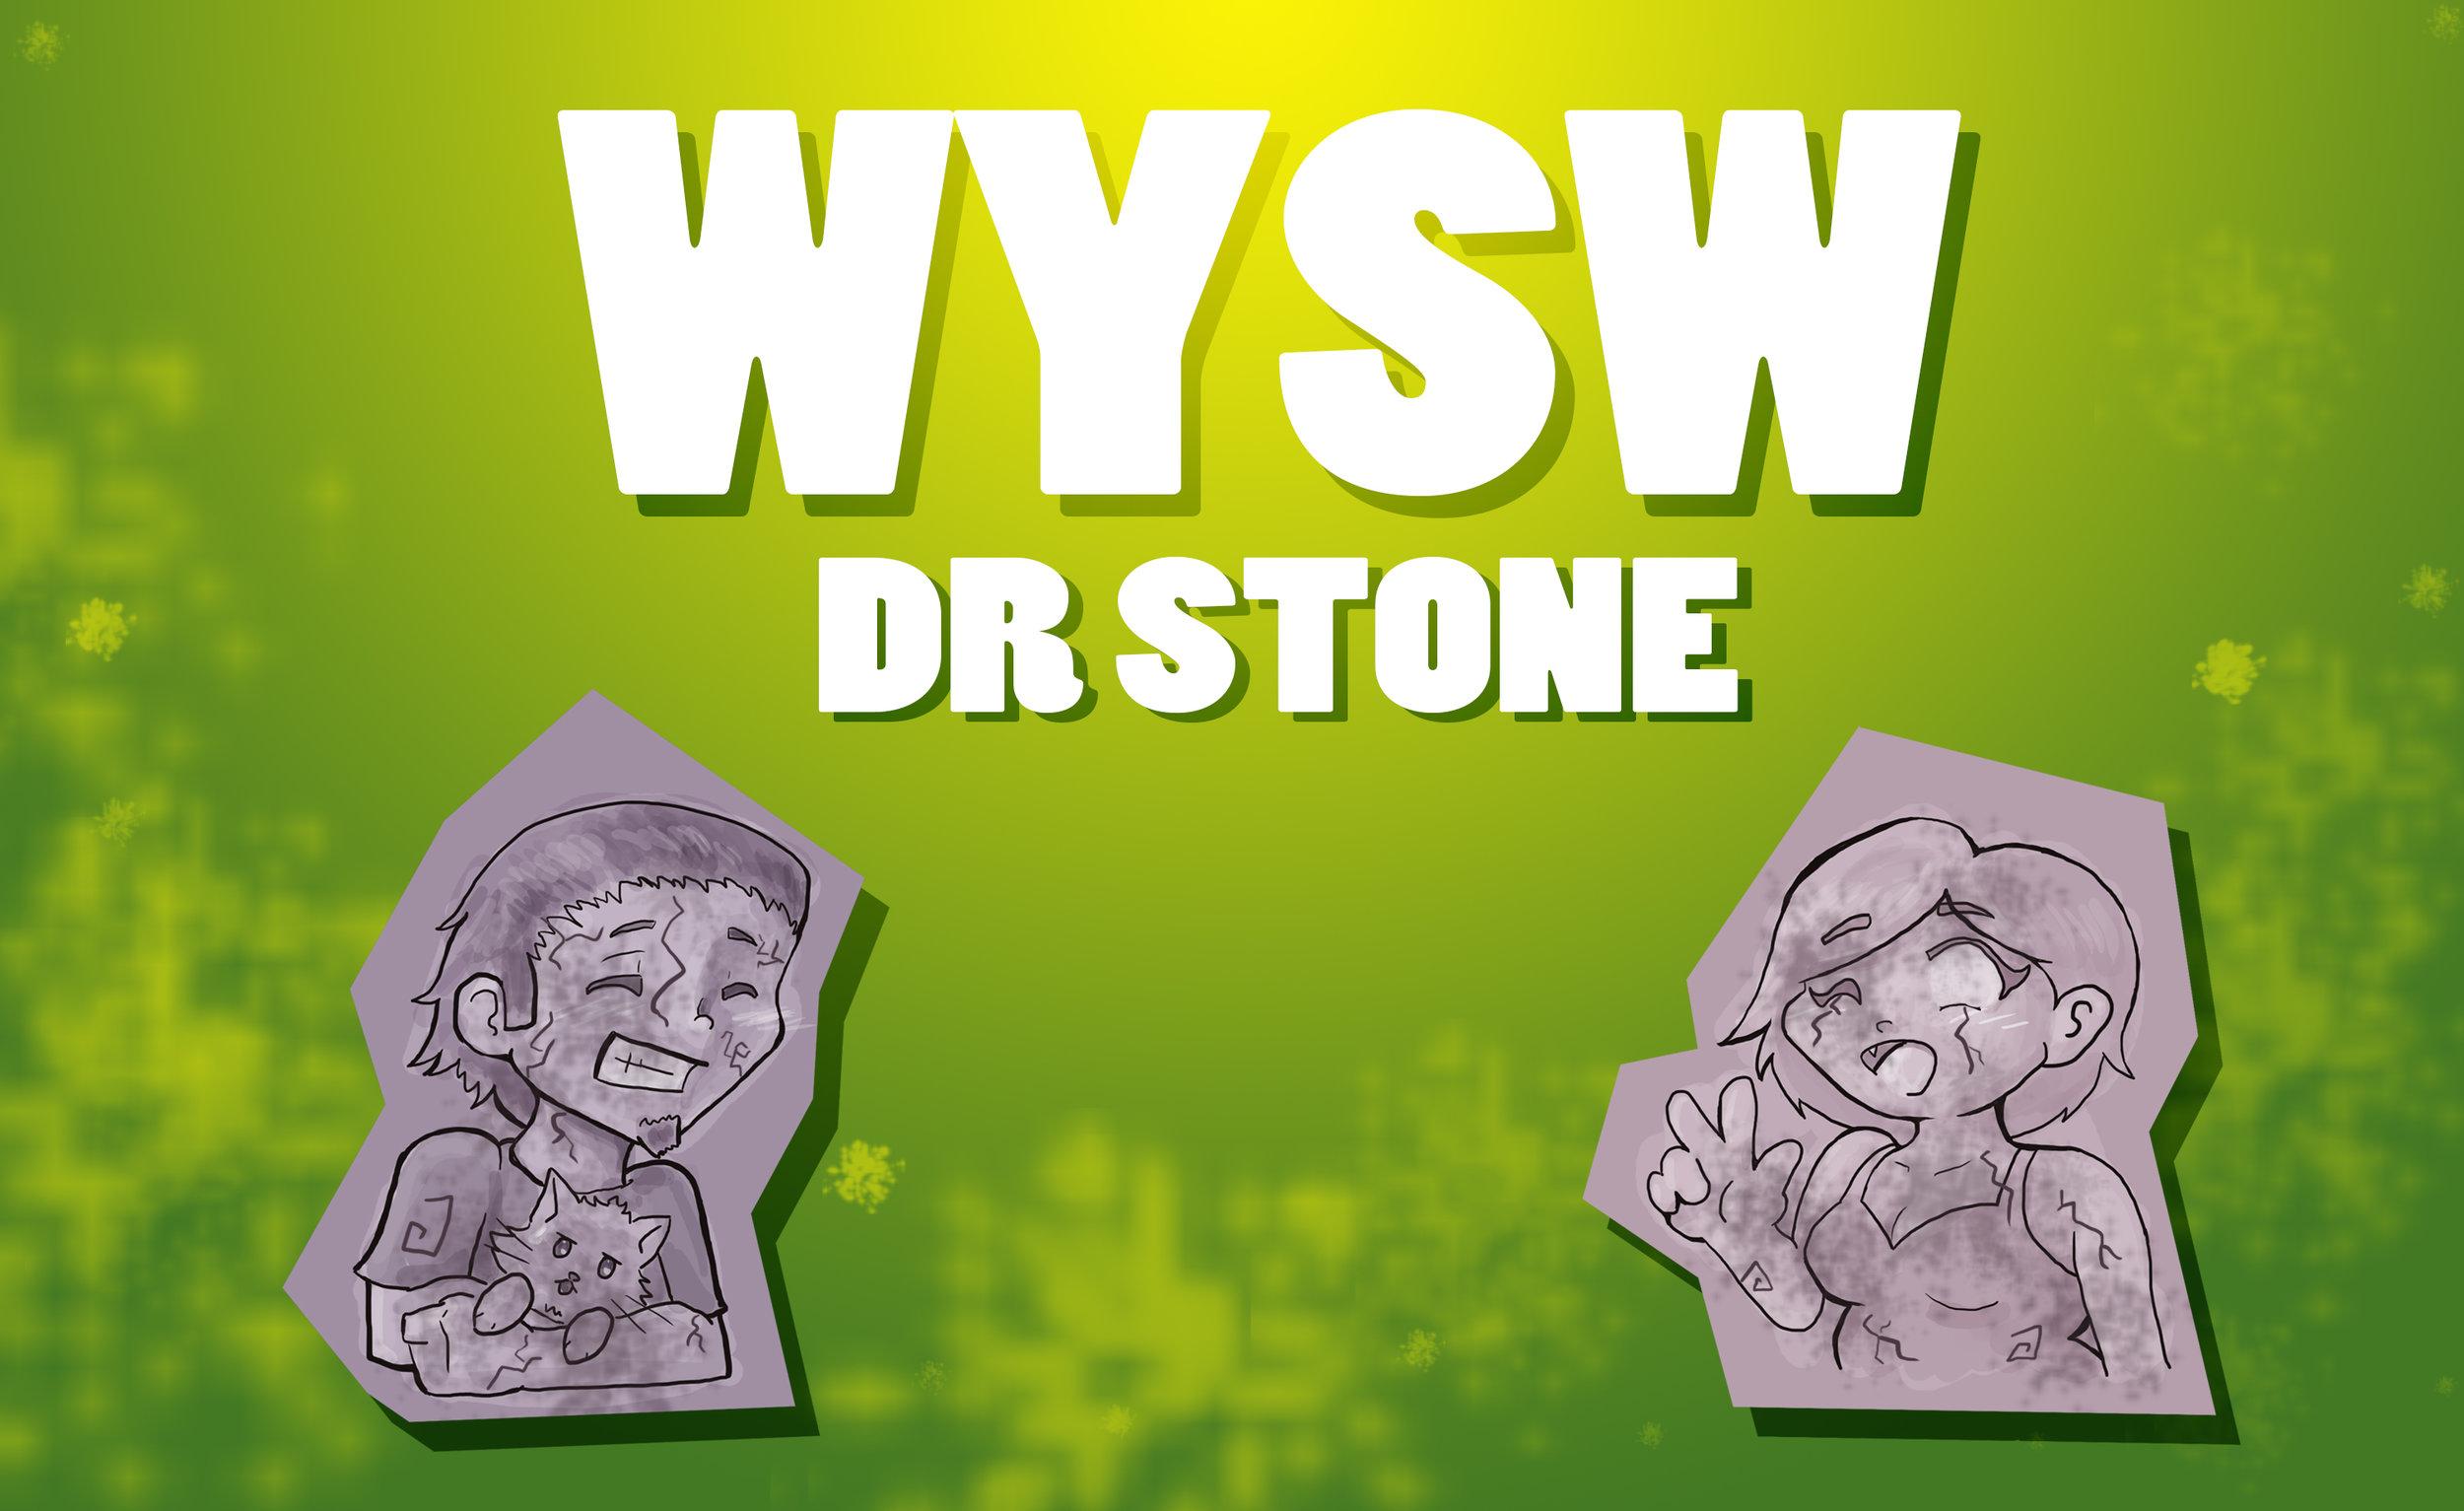 dr stone.jpg